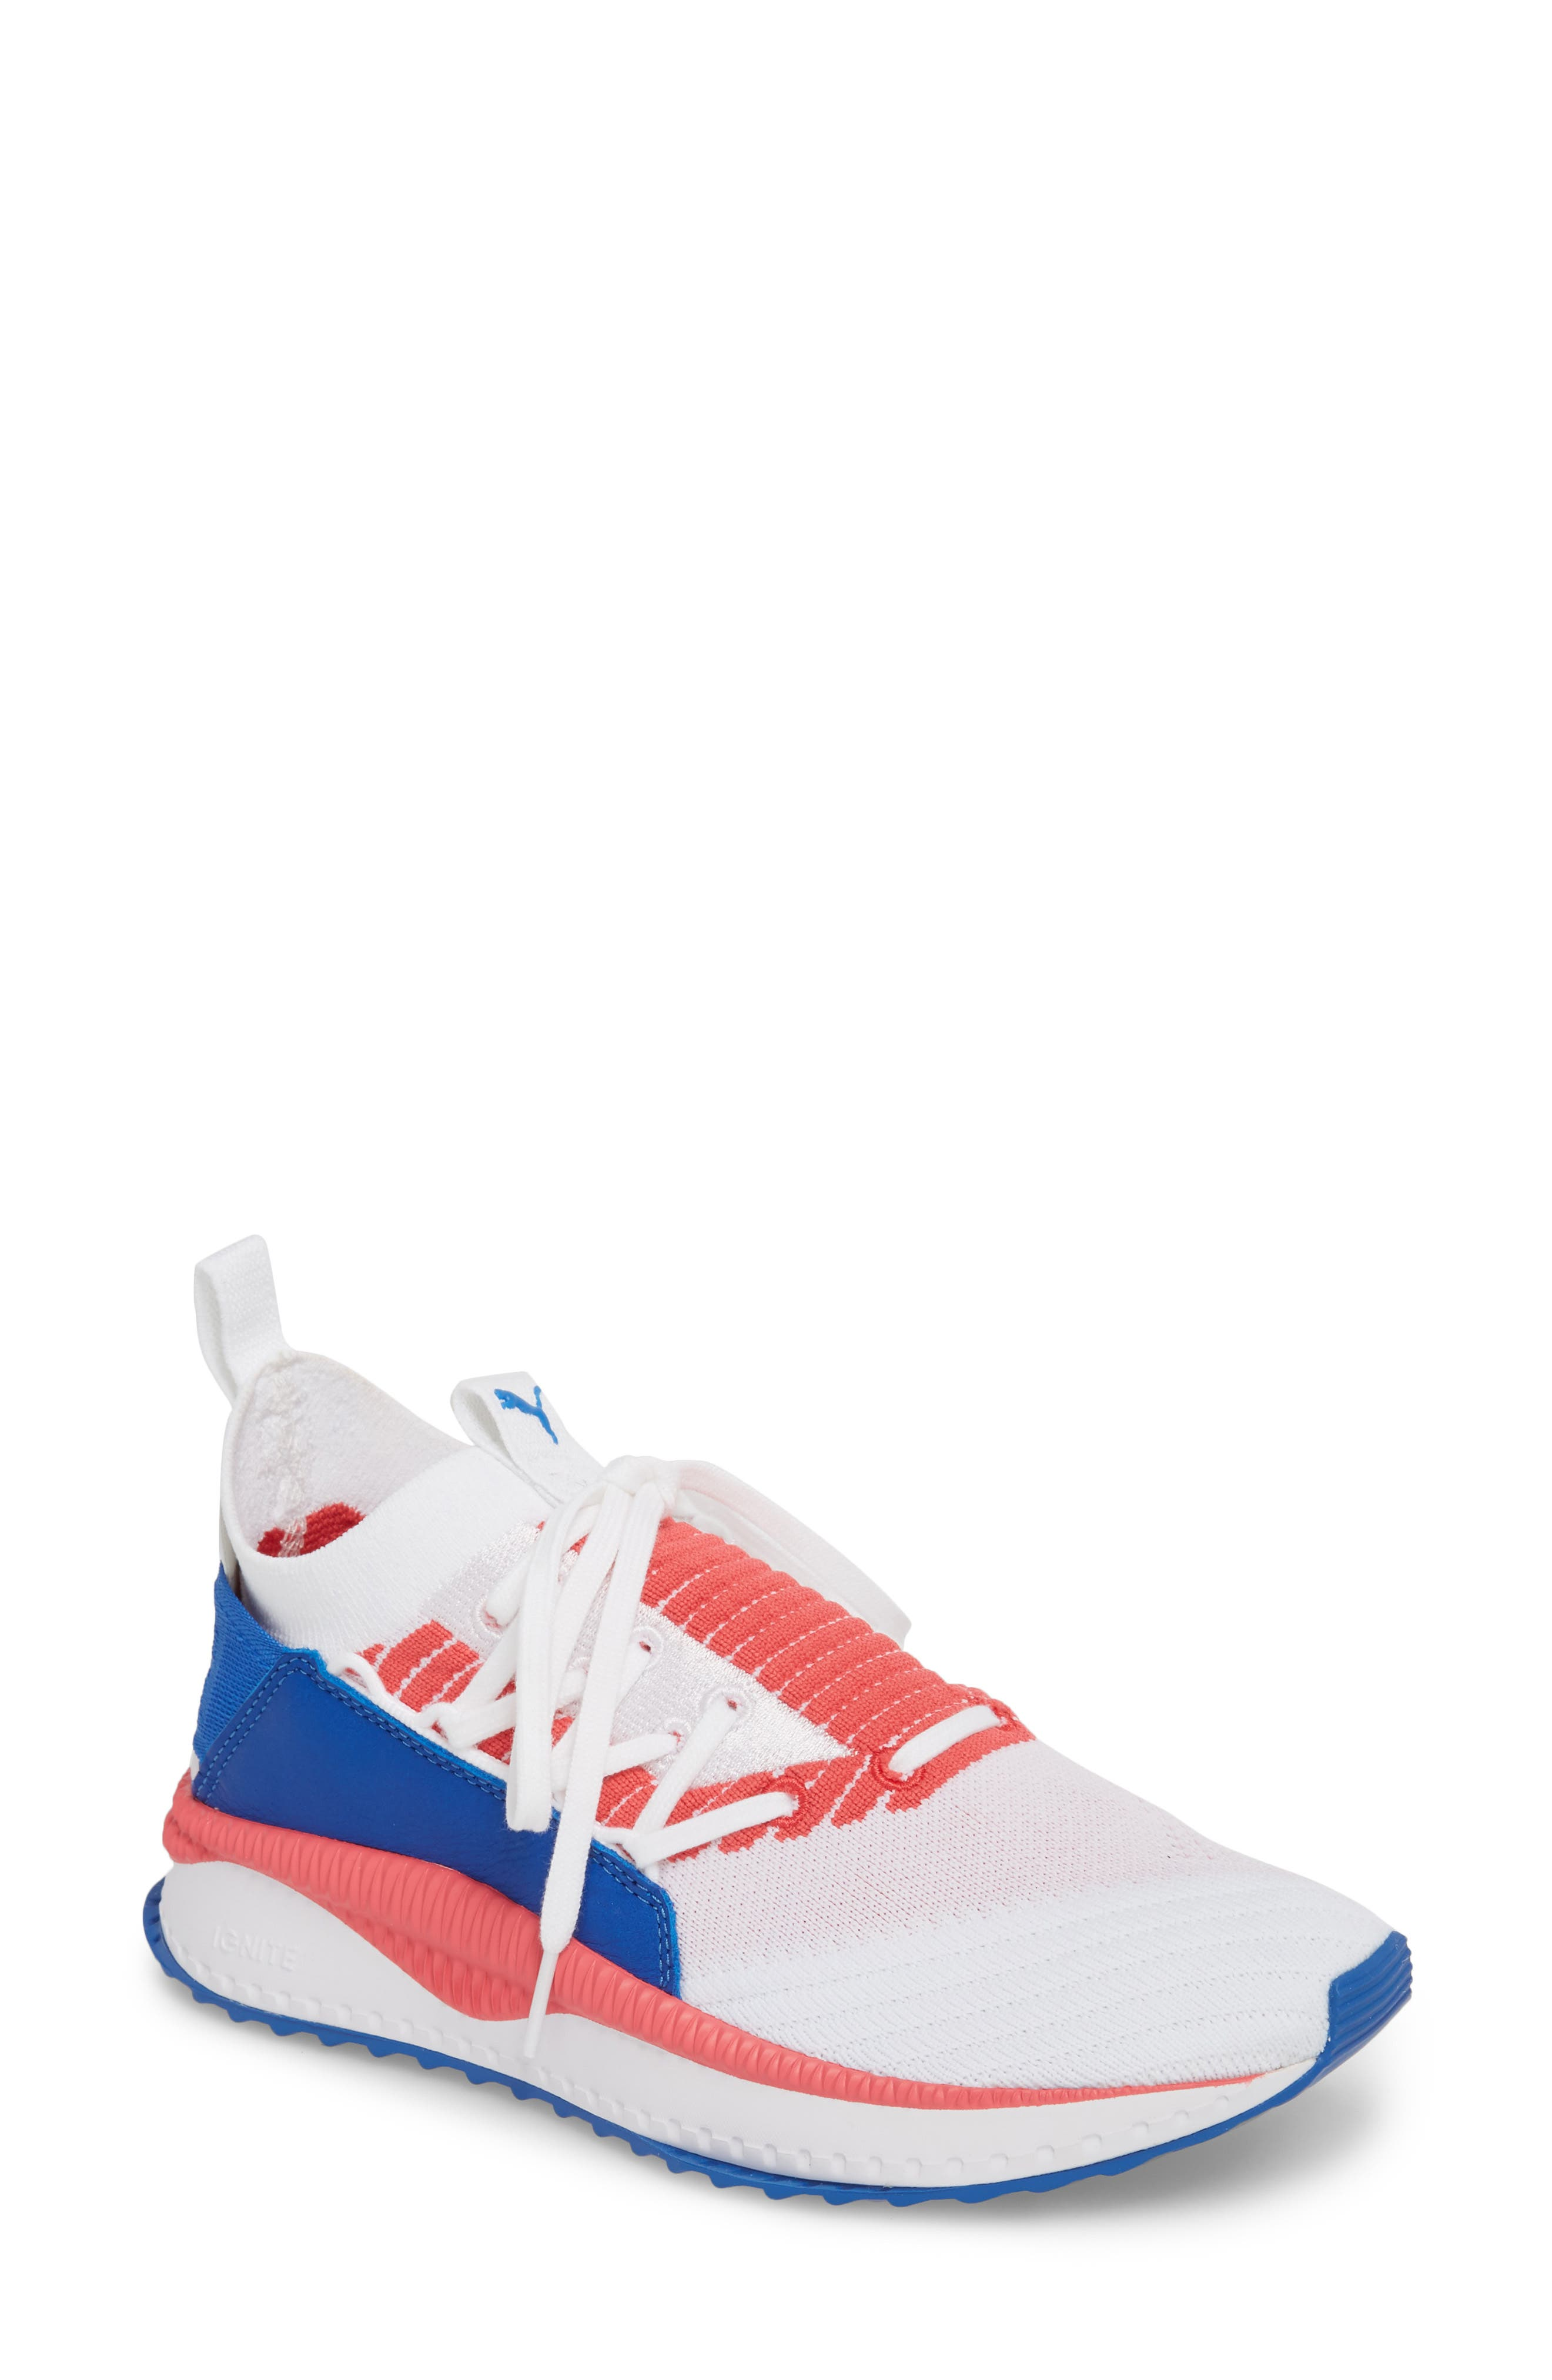 Tsugi Jun Knit Sneaker,                             Main thumbnail 6, color,